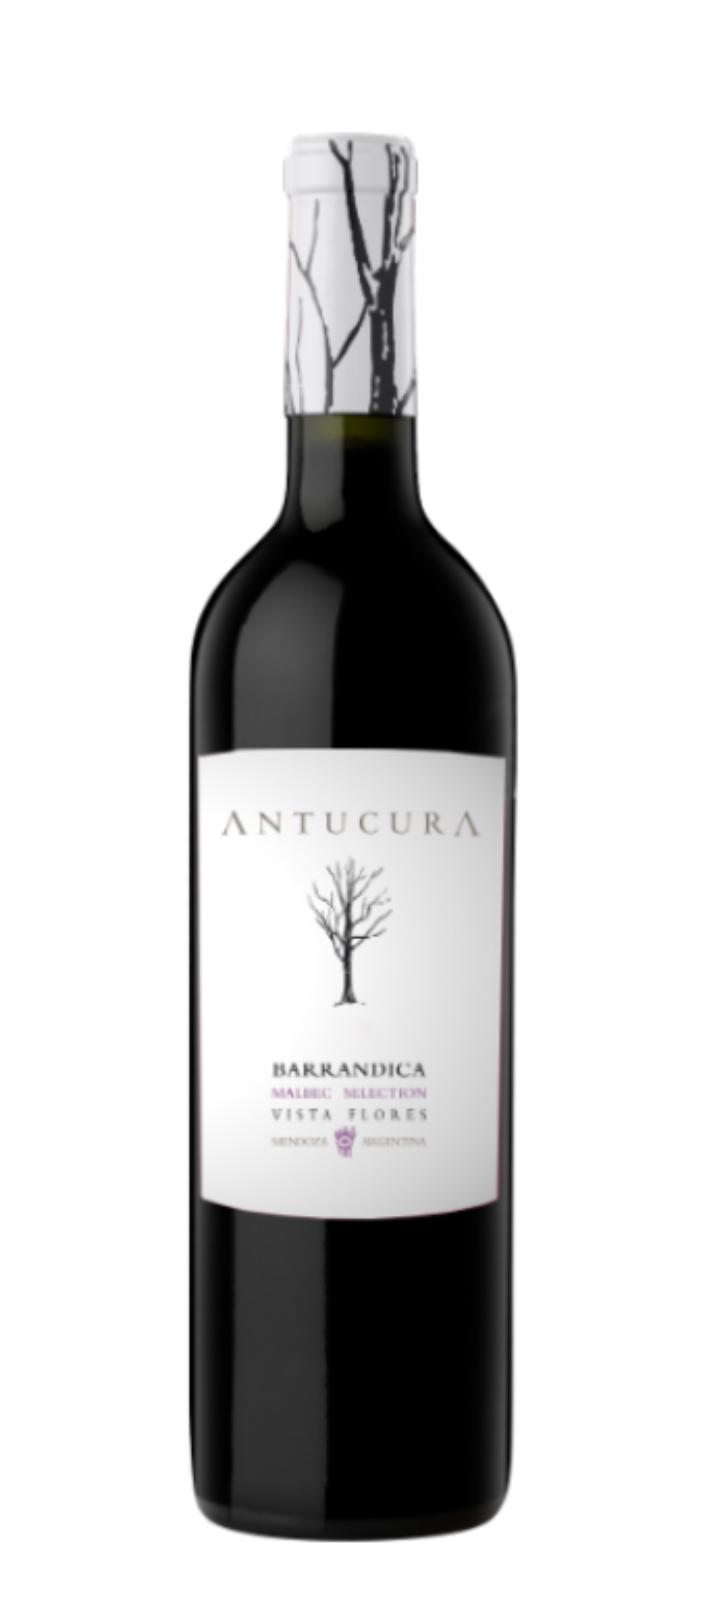 Bodega Antucura Barrandica - 2018 -Mendoza - ROUGE